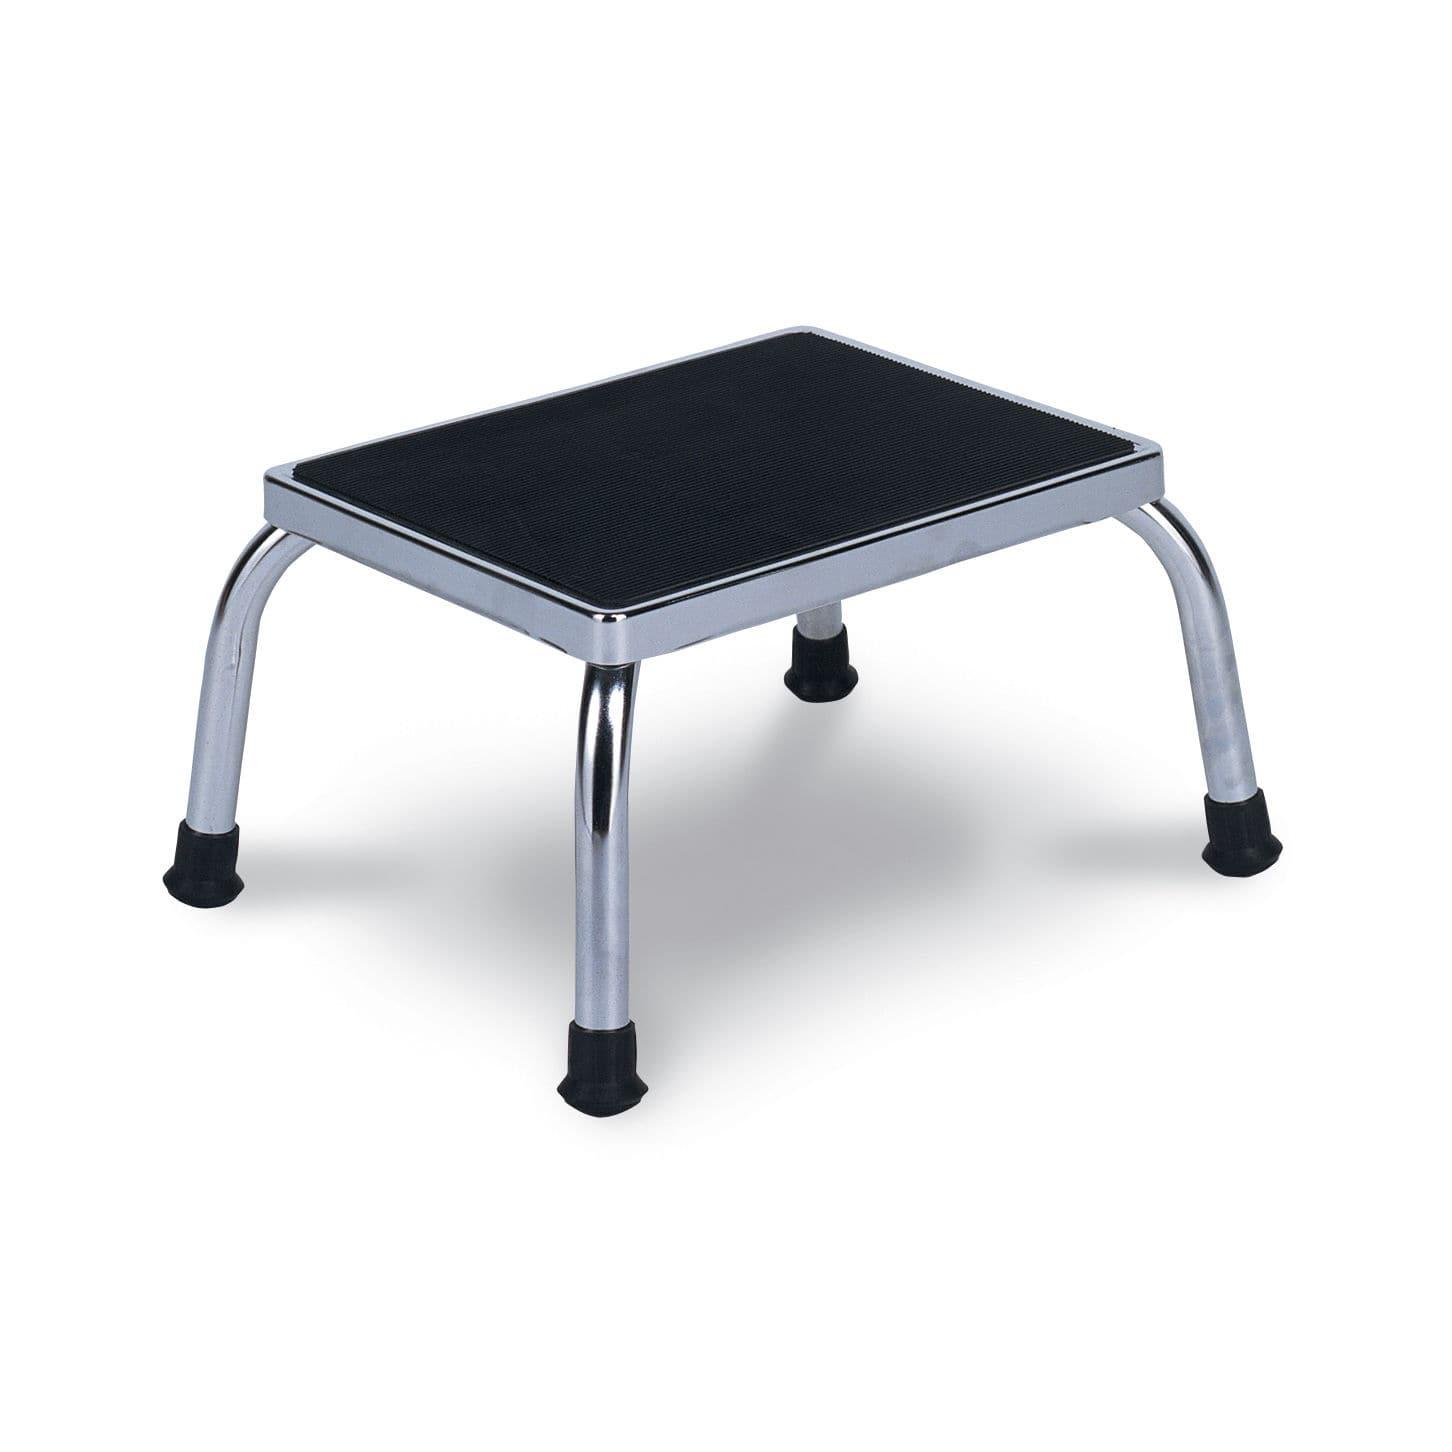 Remarkable 1 Step Step Stool 4220 Winco Mfg Llc Machost Co Dining Chair Design Ideas Machostcouk